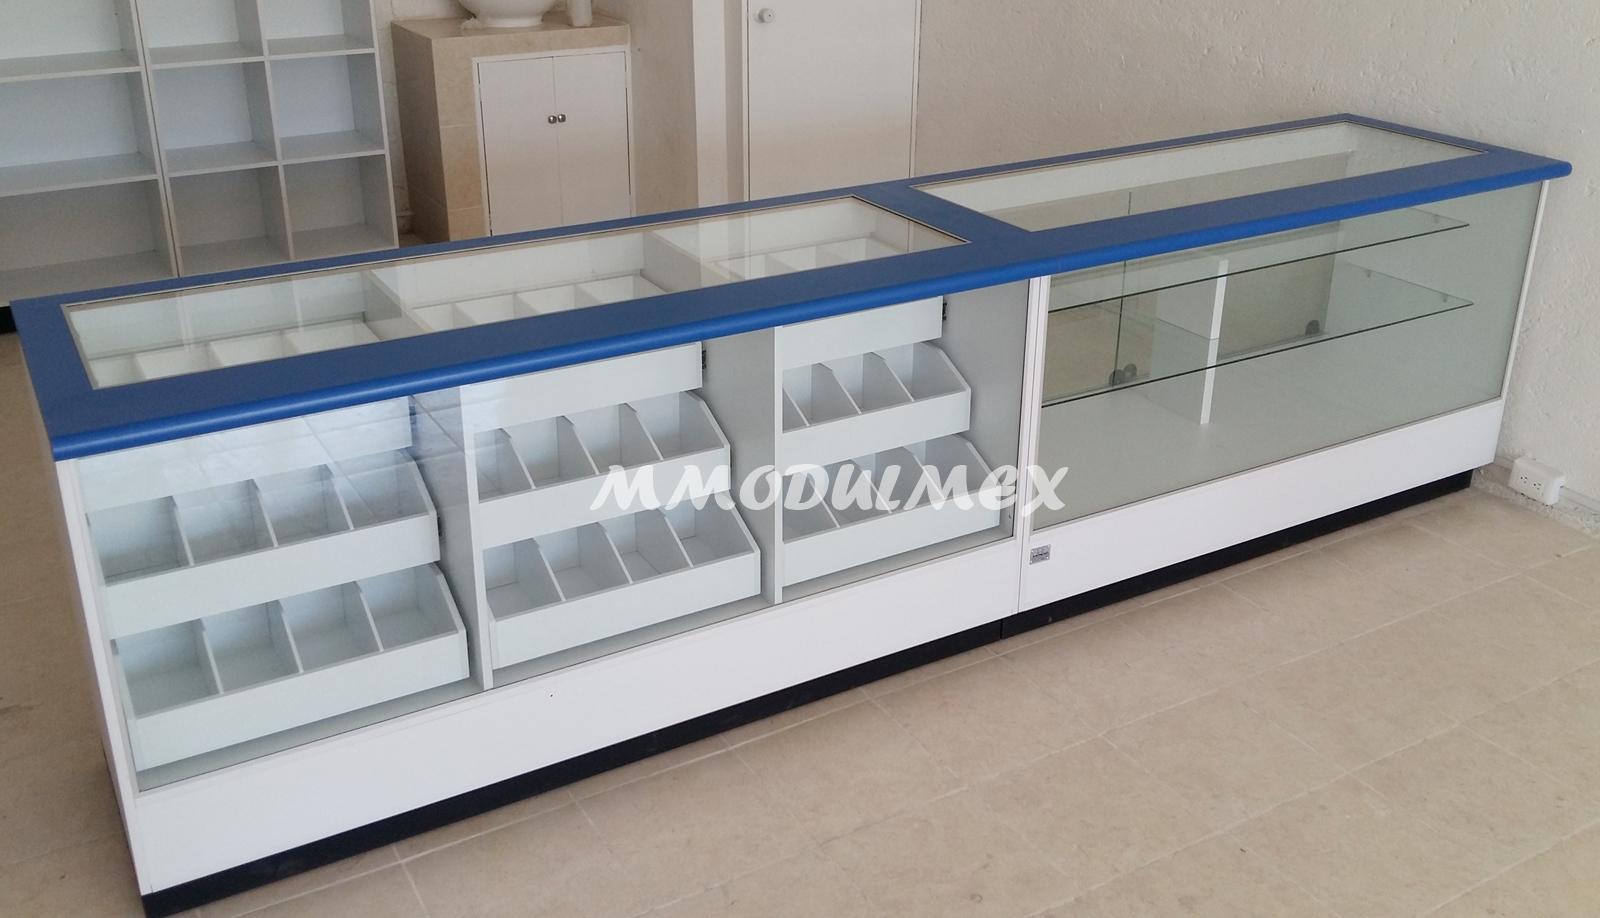 Mostradores vitrinas estantes estanter a anaqueles for Almacenes de muebles